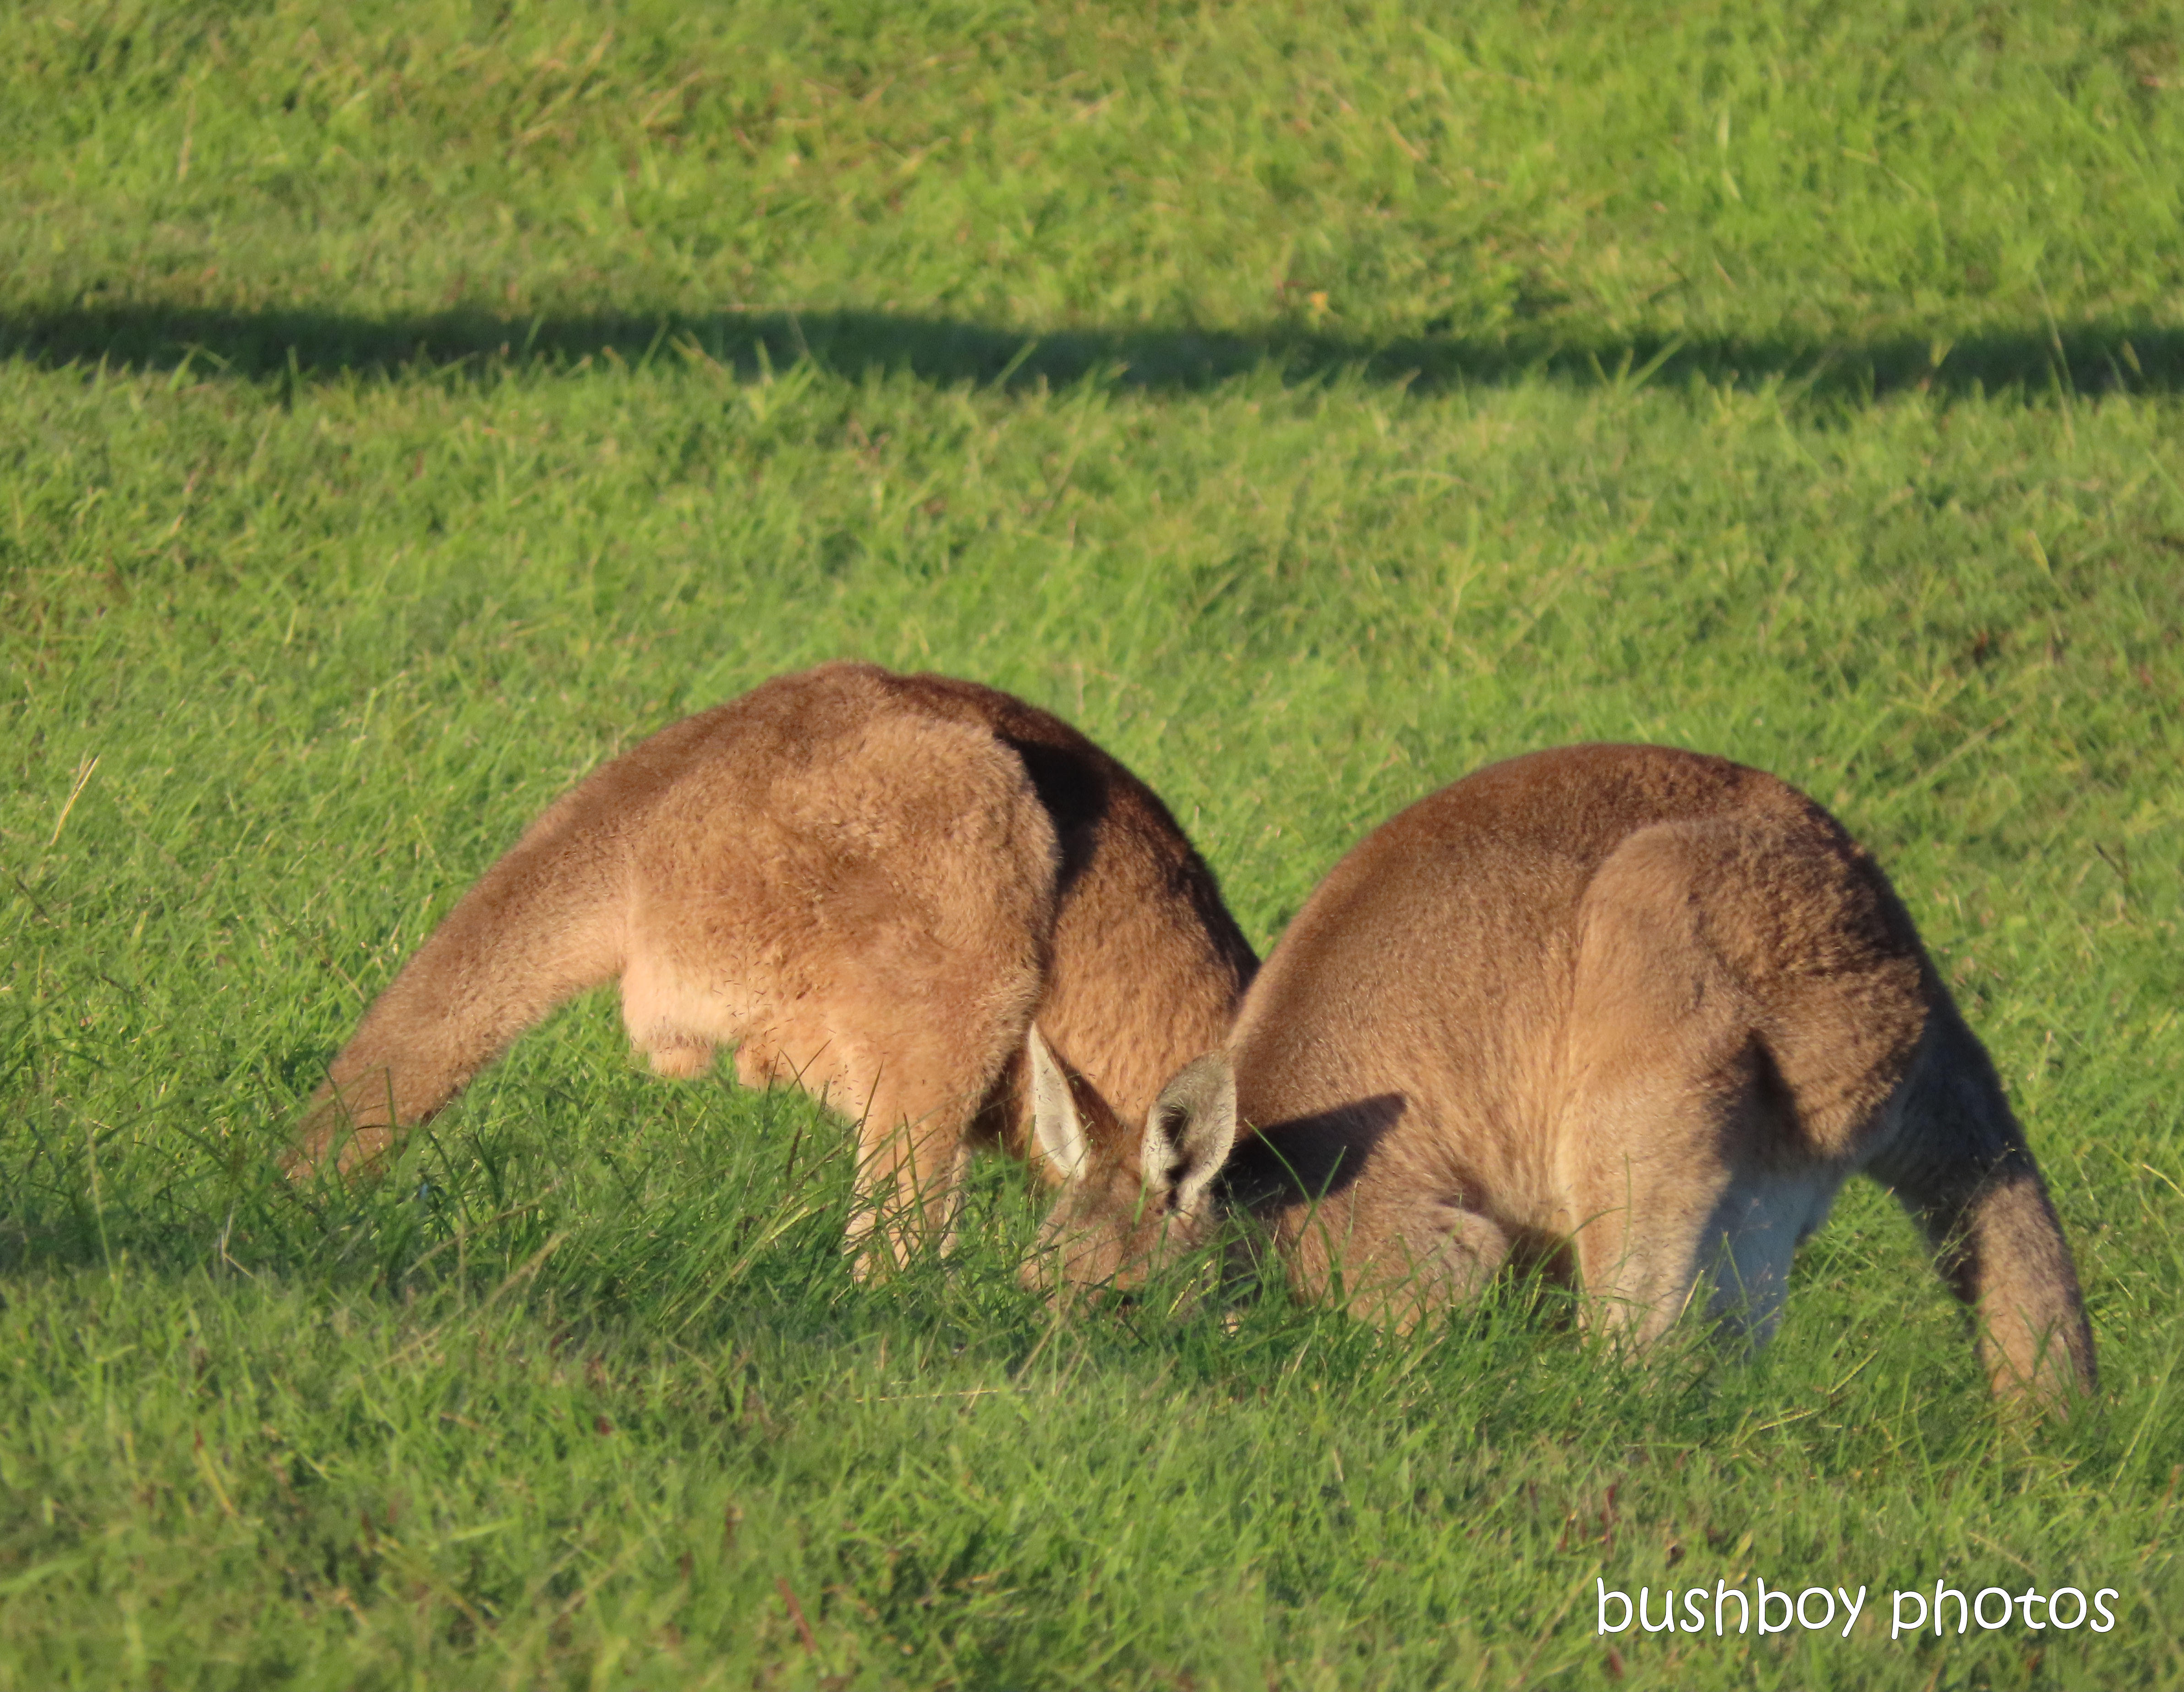 190619_blog_challenge_two_kangaroos